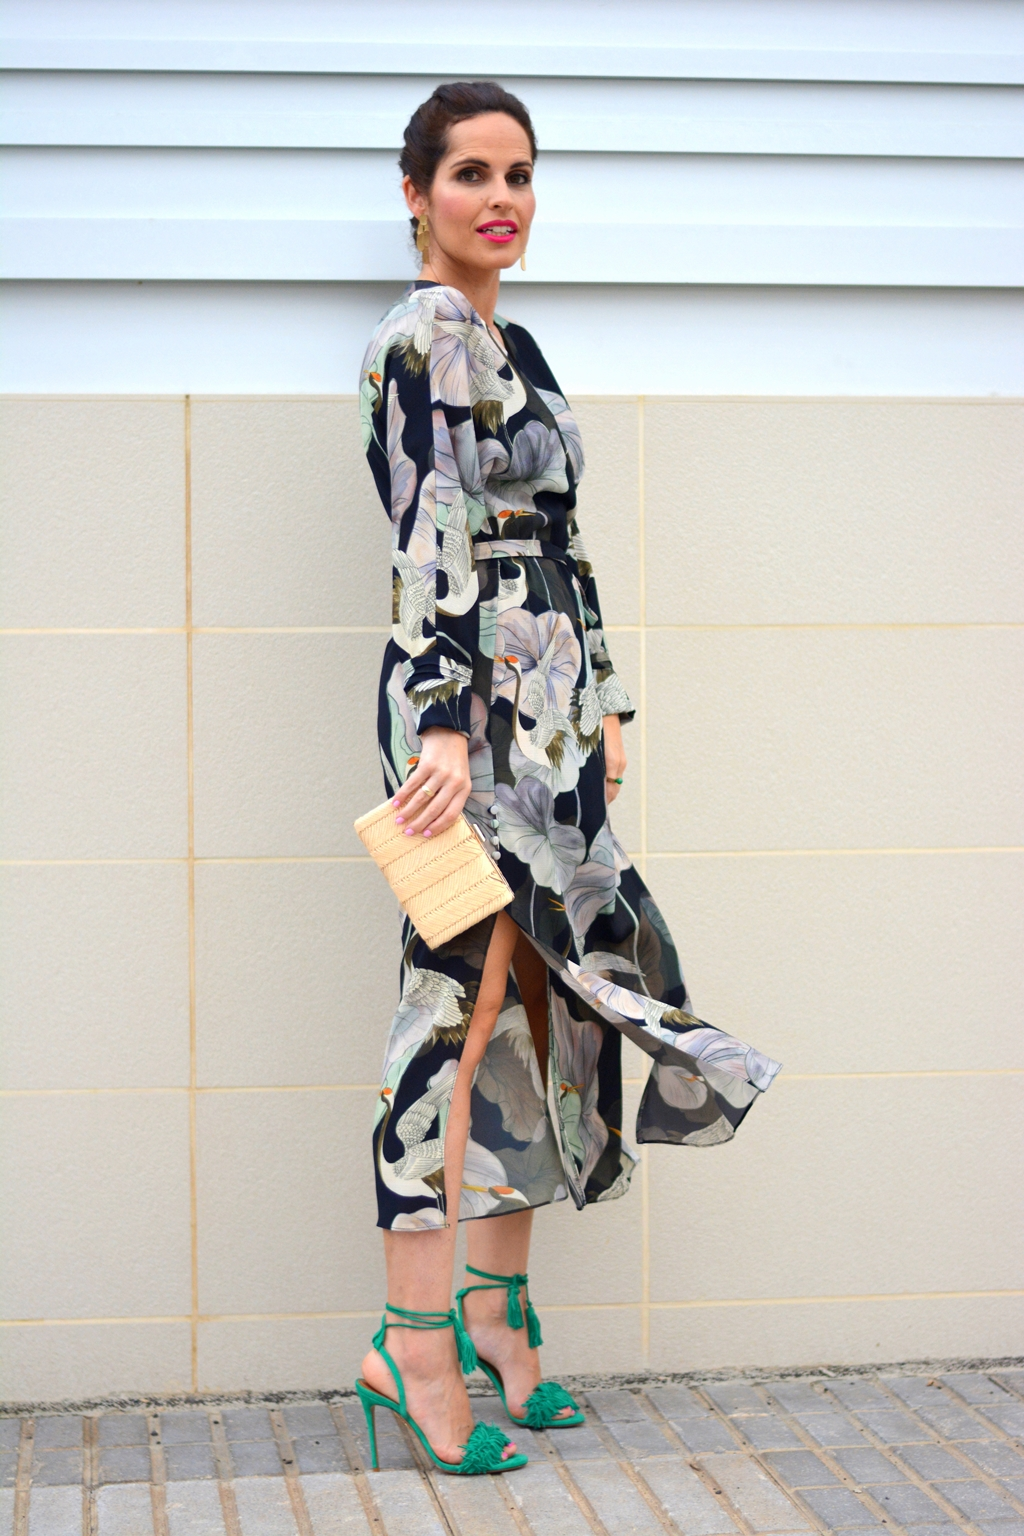 zara-kimono-dress-outfit-special-occasion